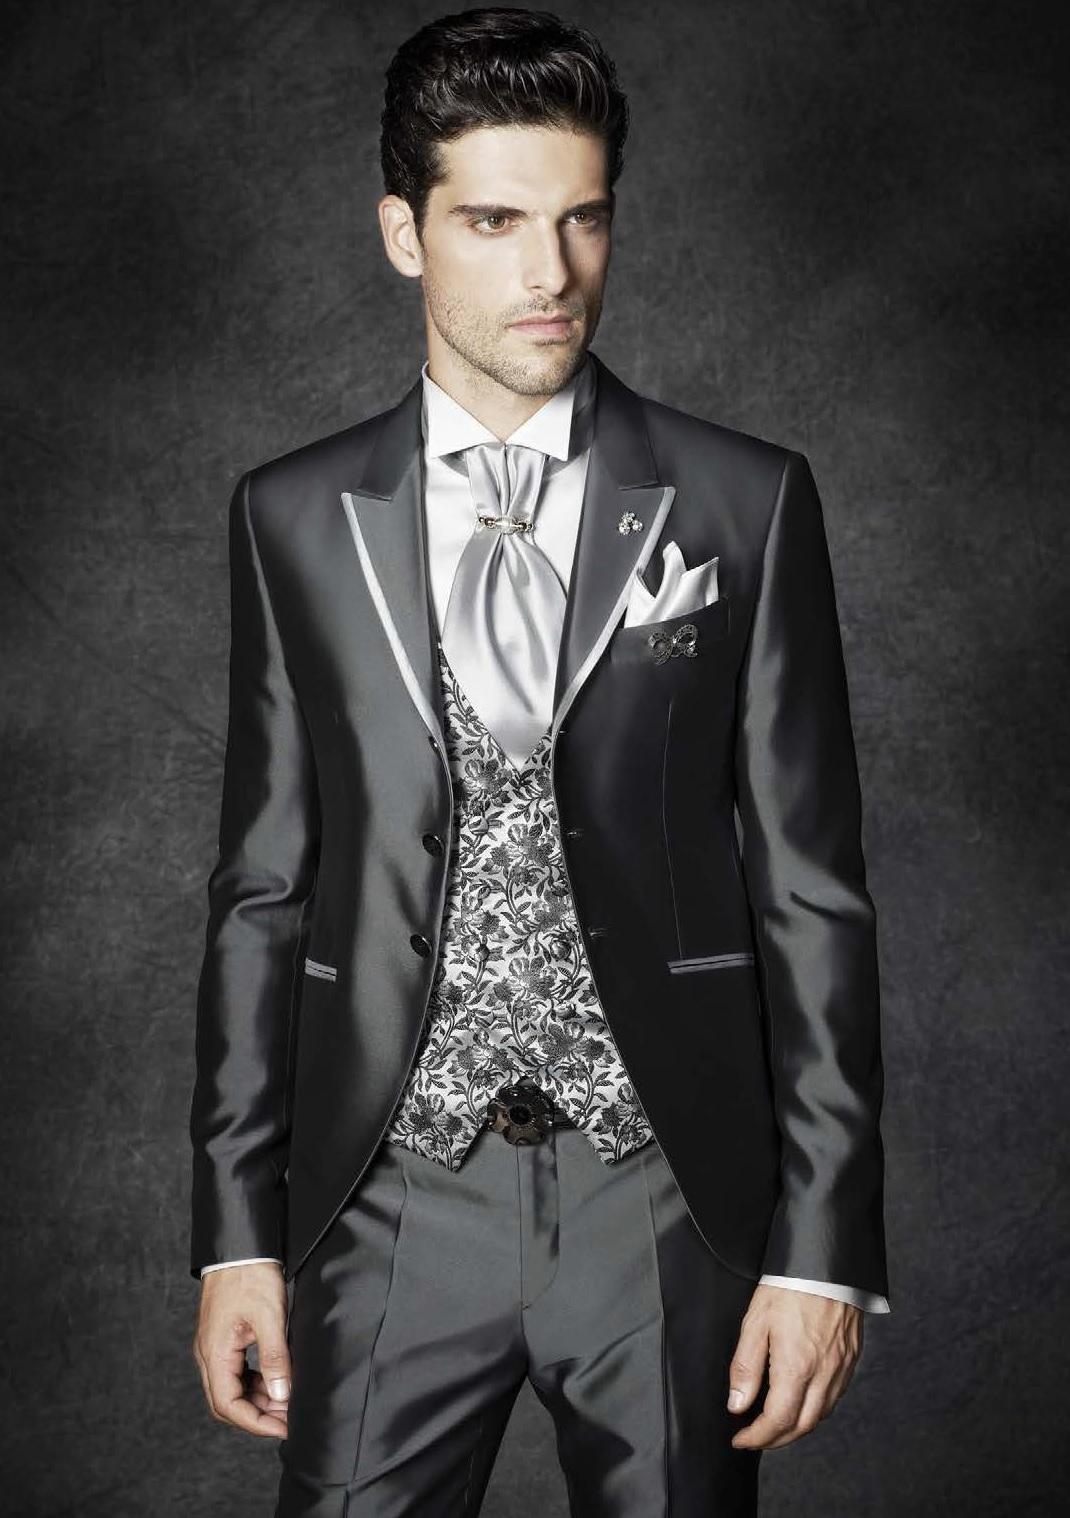 6d8e7779ba83 Formal Ascot Ties South Miami Tuxedo Accessories